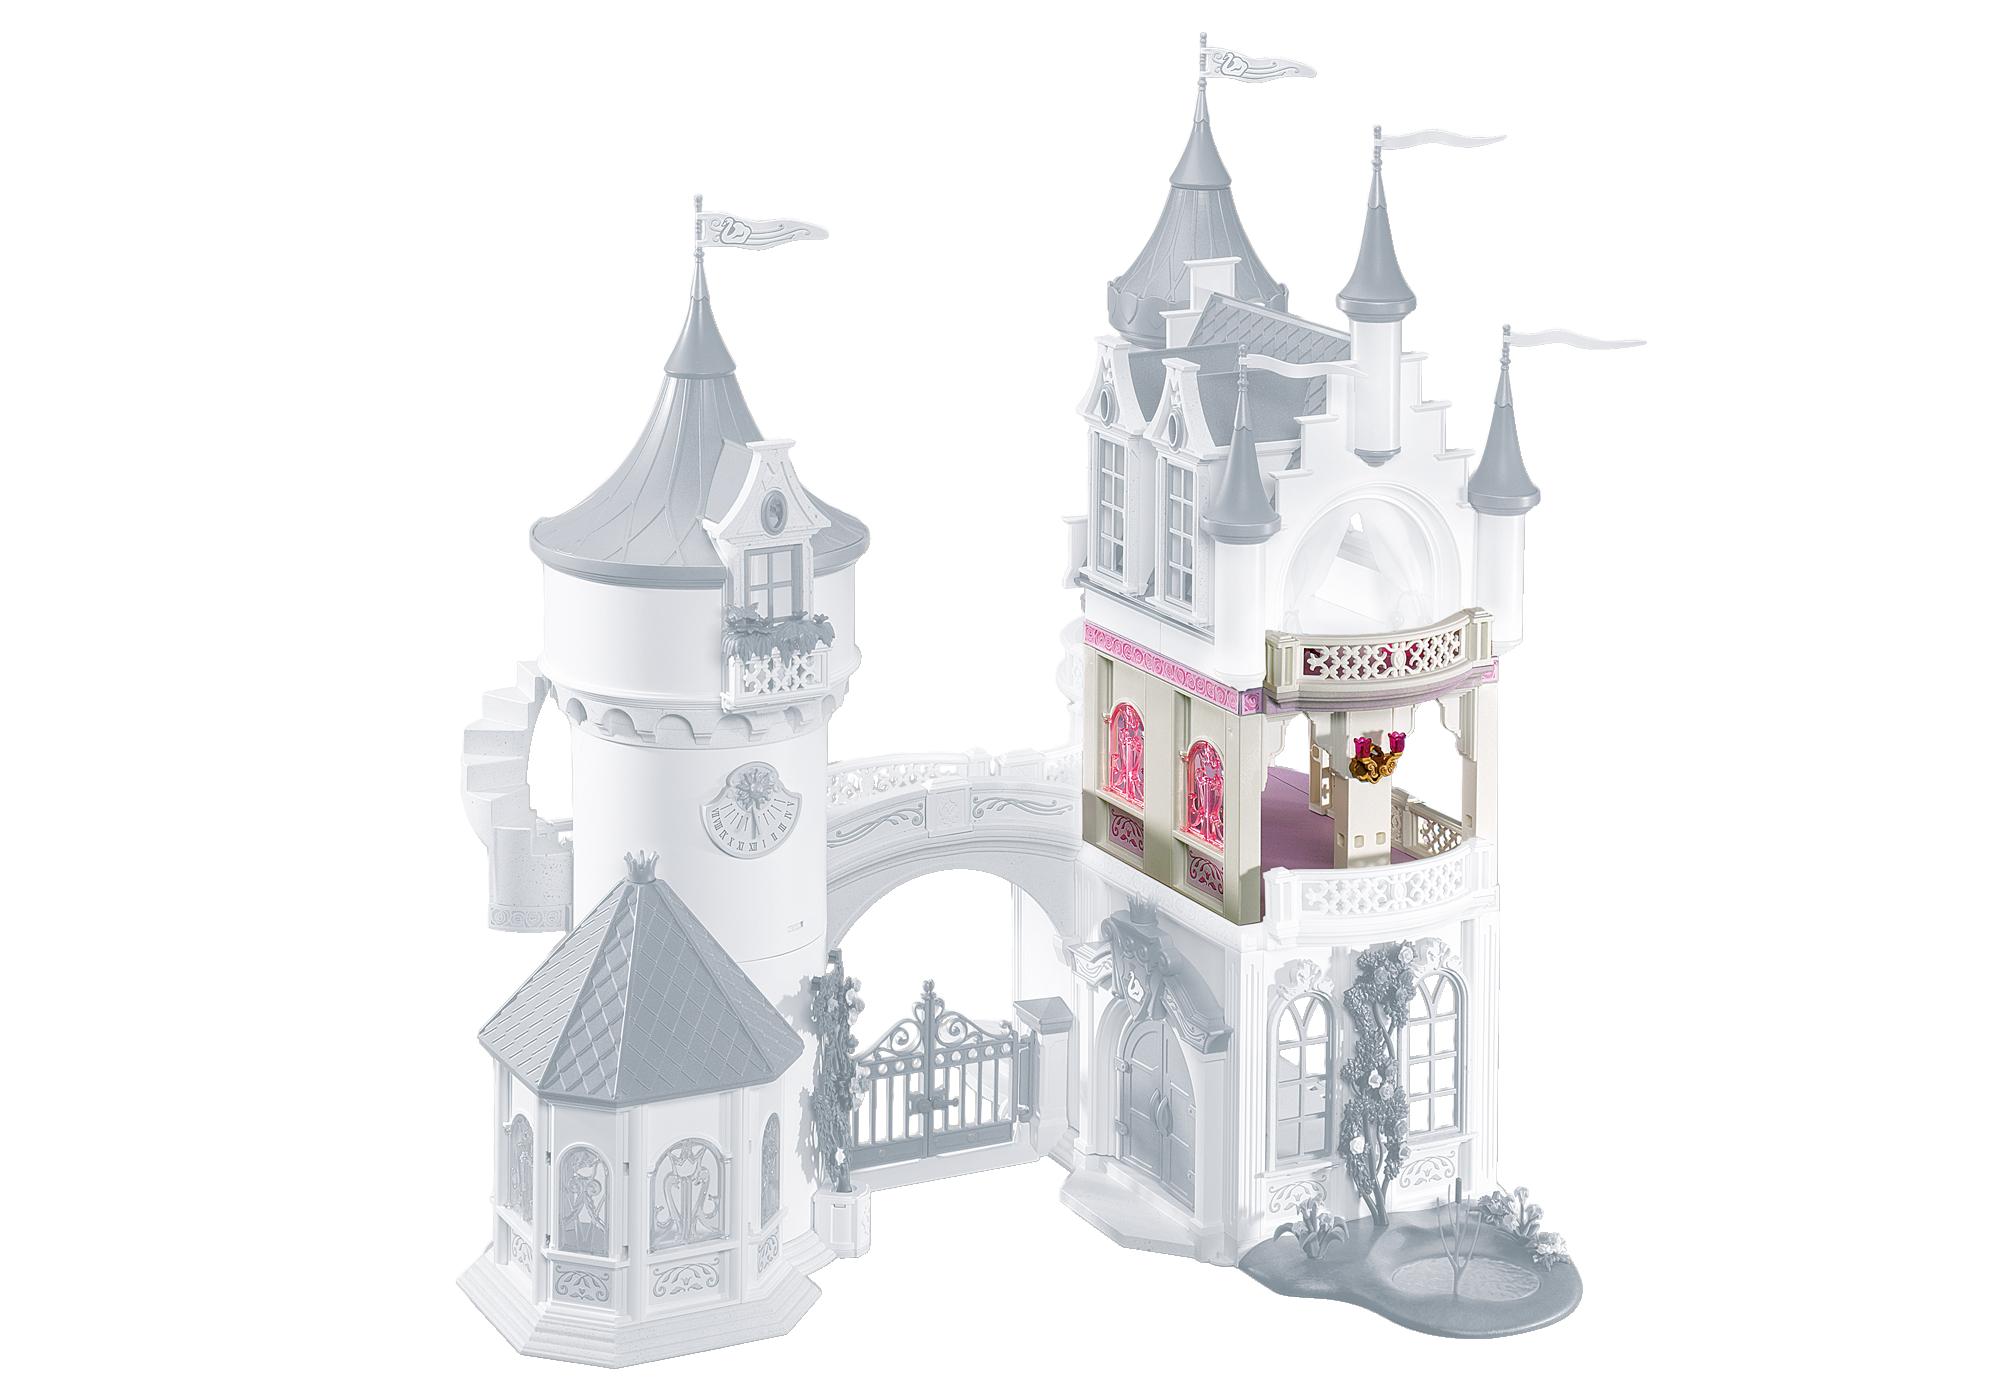 http://media.playmobil.com/i/playmobil/6236_product_detail/Etagenergänzung Prinzessinnenschloss